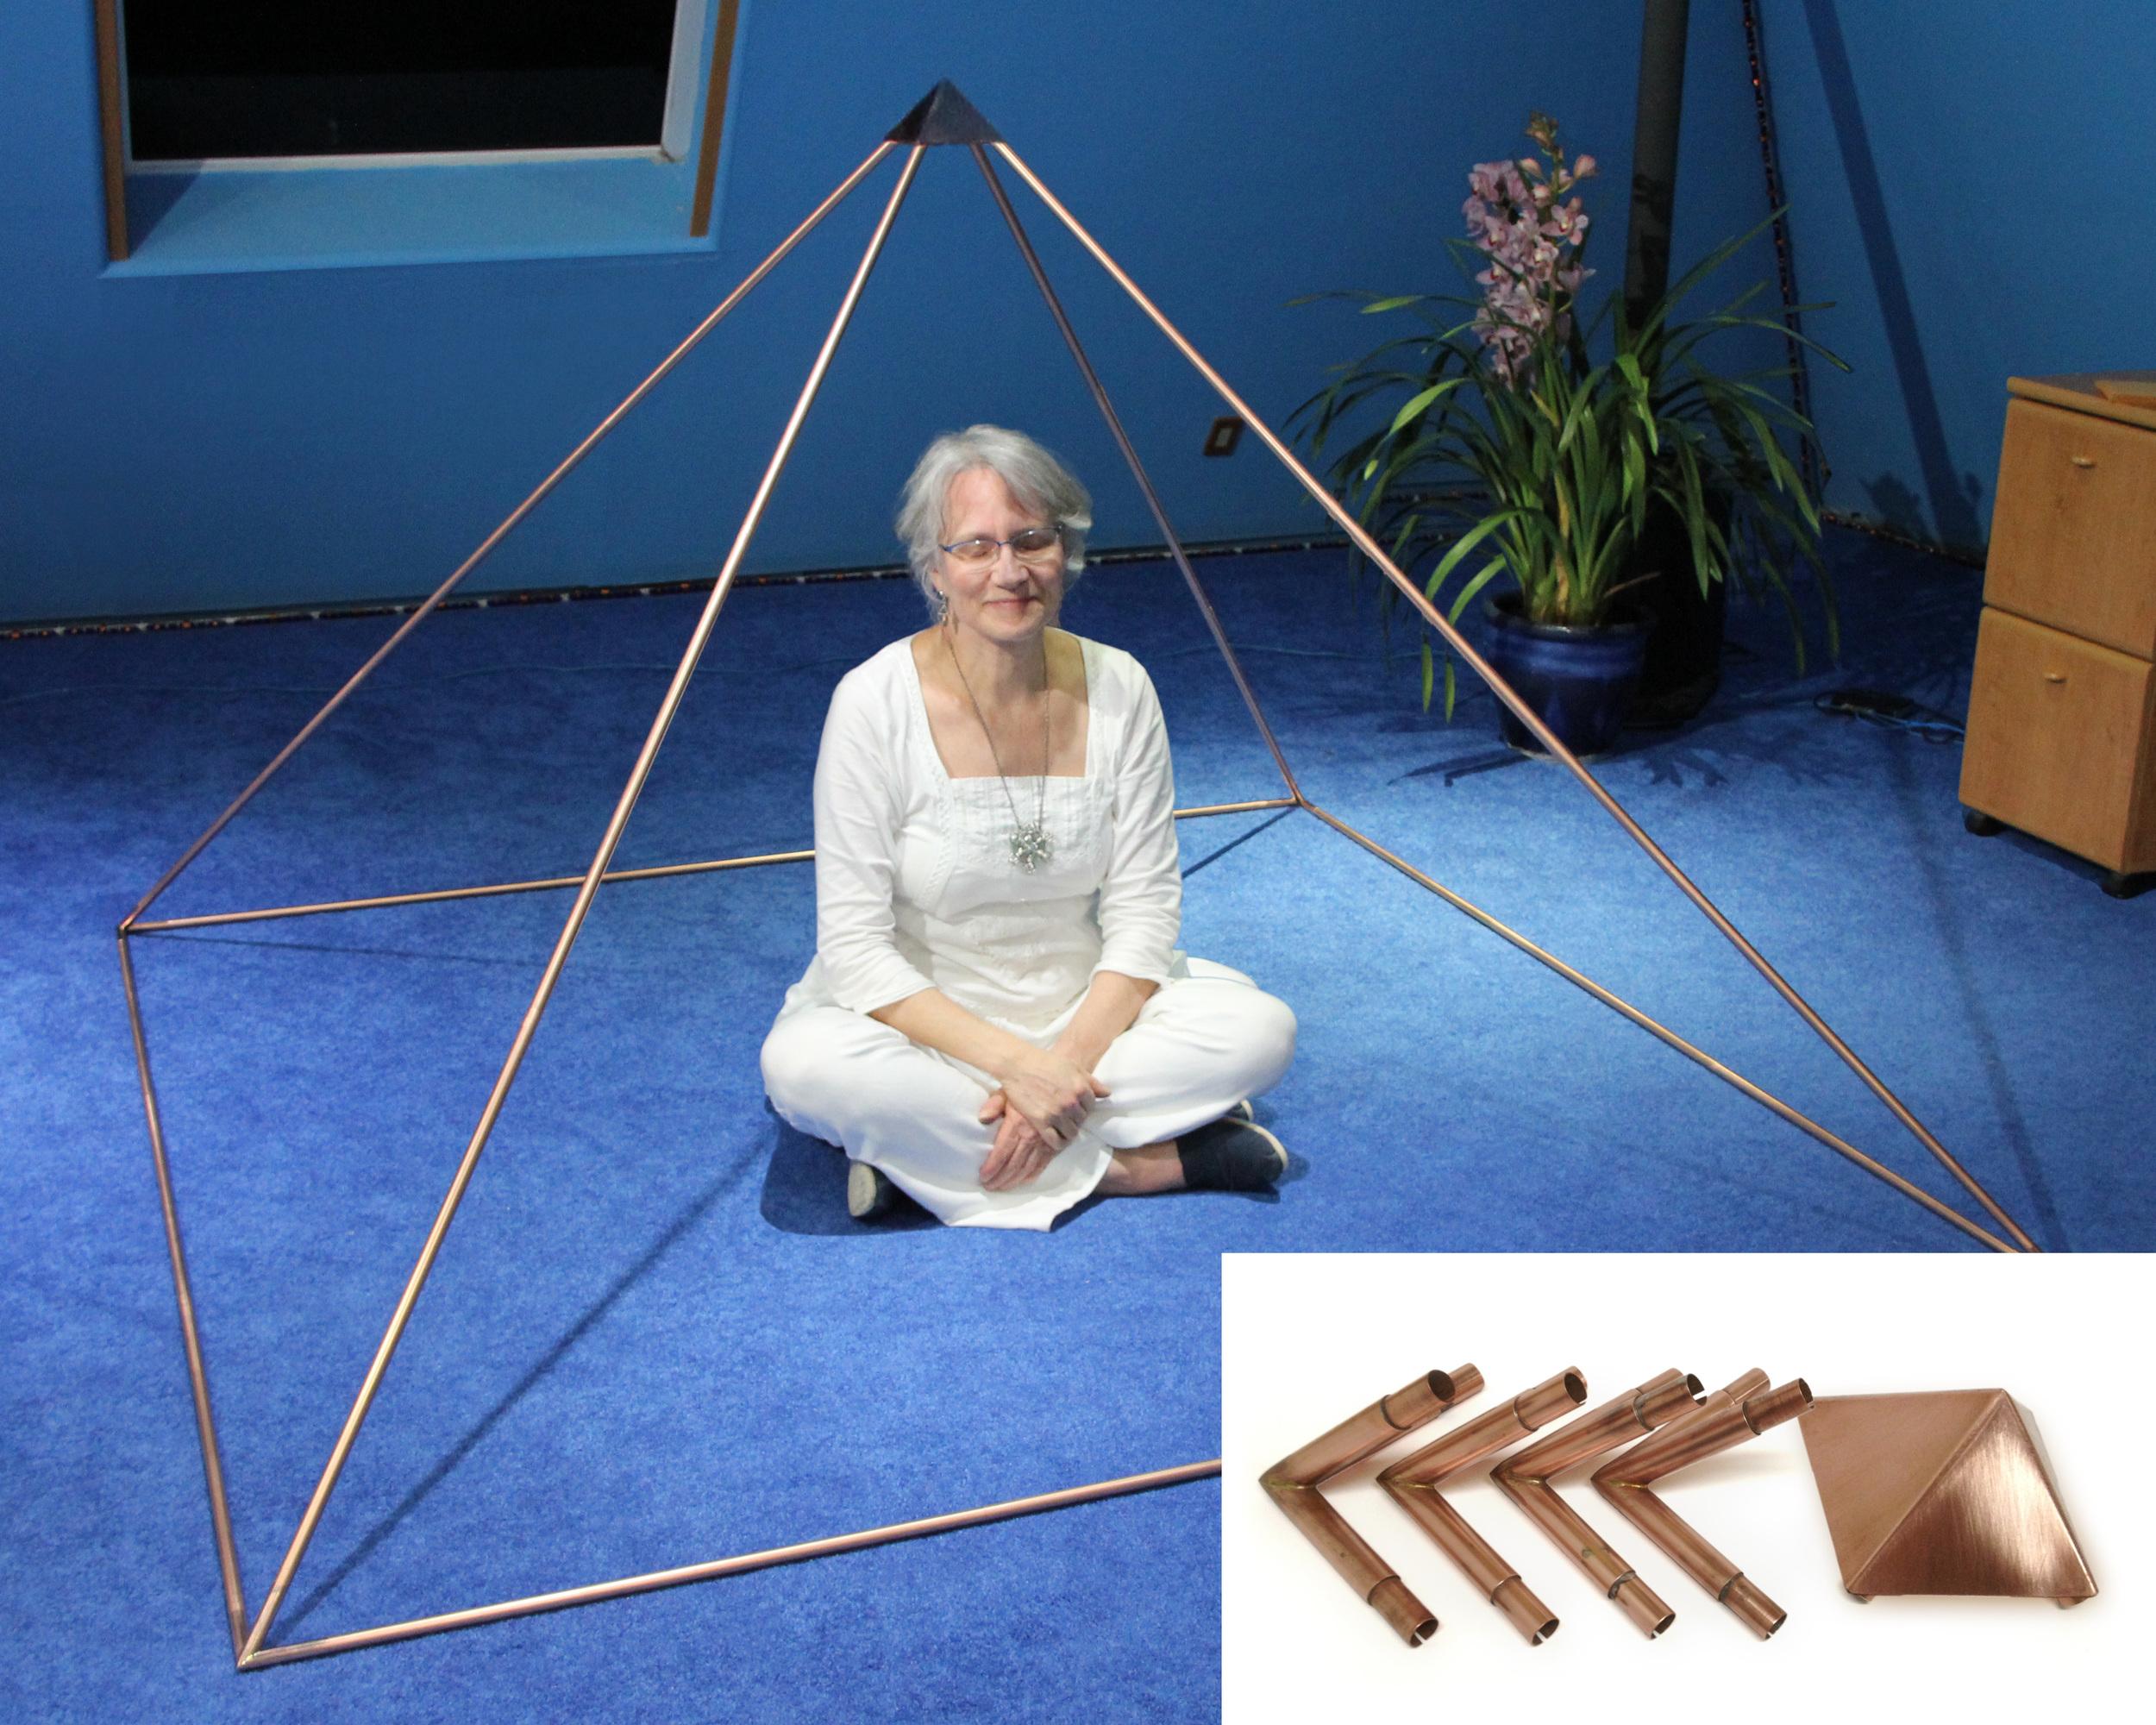 Copper Meditation Pyramid Systems — The Meditation Pyramids of the